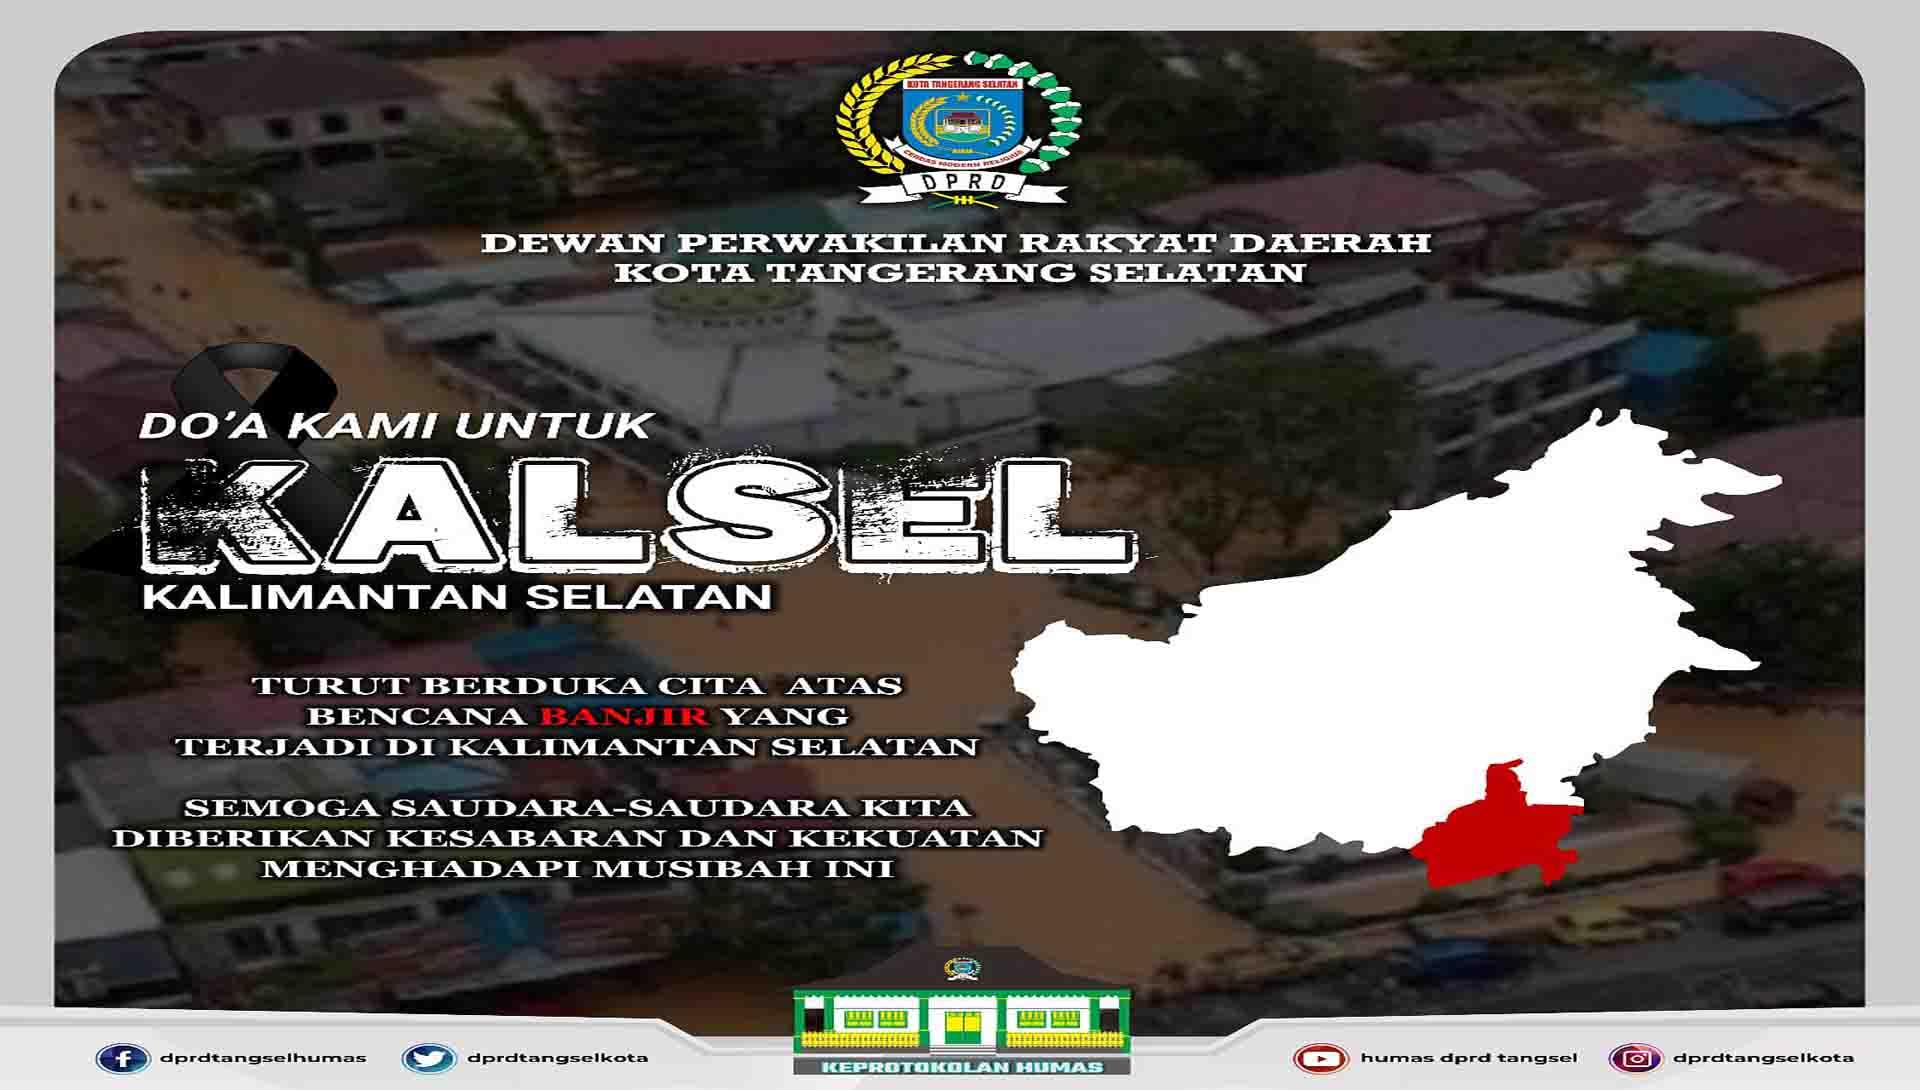 Turut berduka cita atas bencana banjir yang terjadi di KalSel